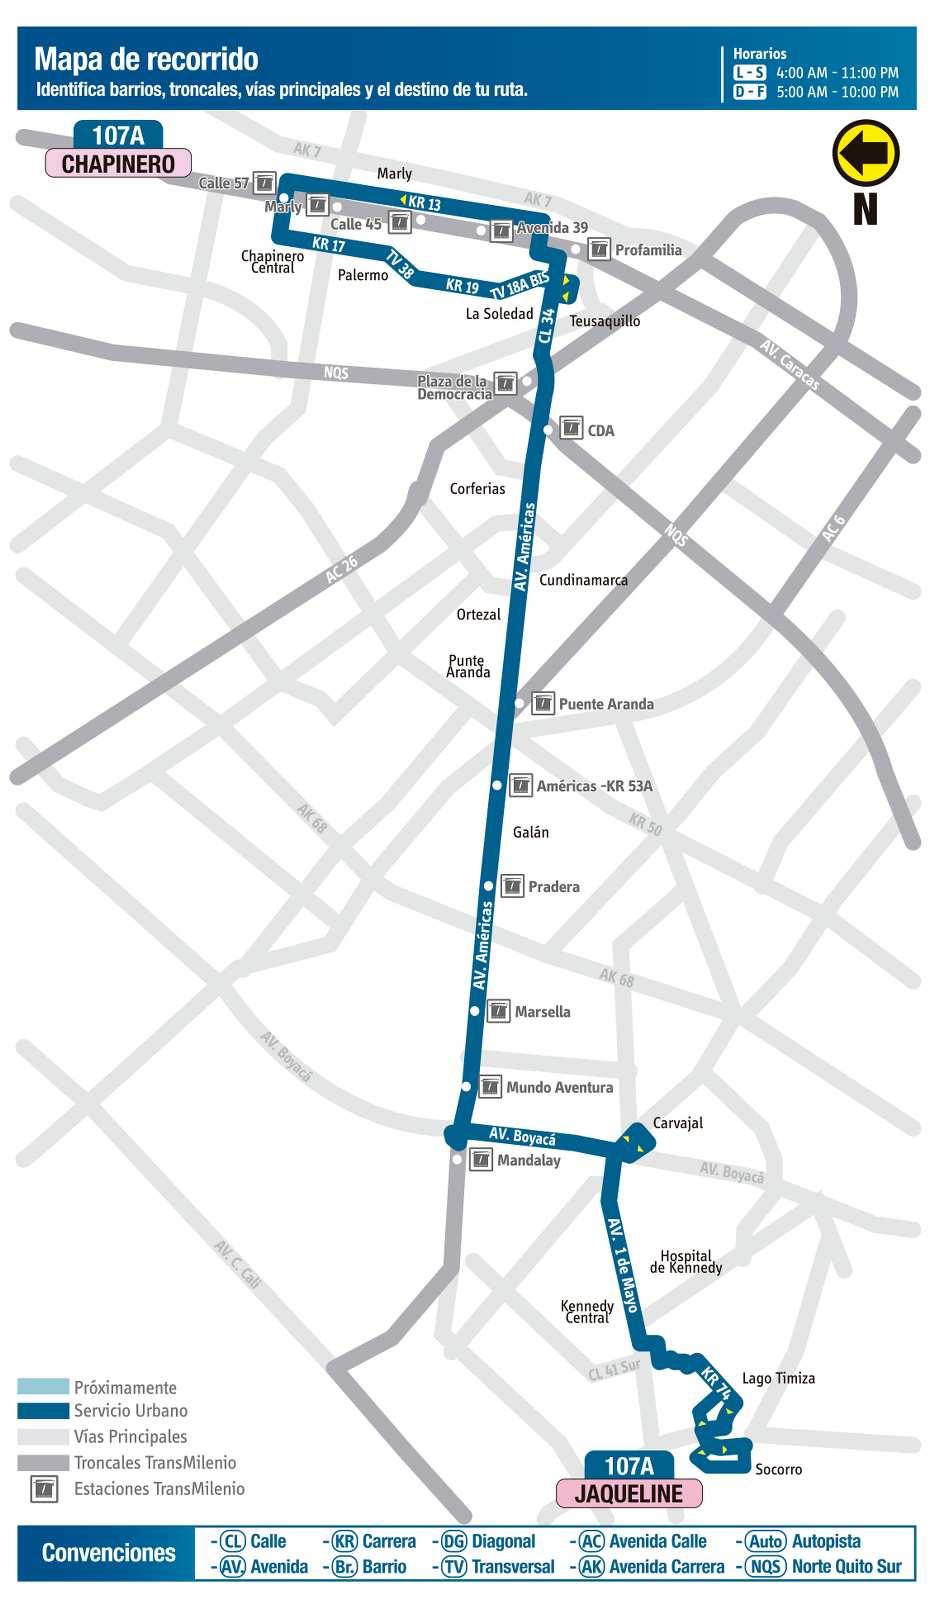 Ruta SITP: 107A Jaqueline ↔ Chapinero (mapa)